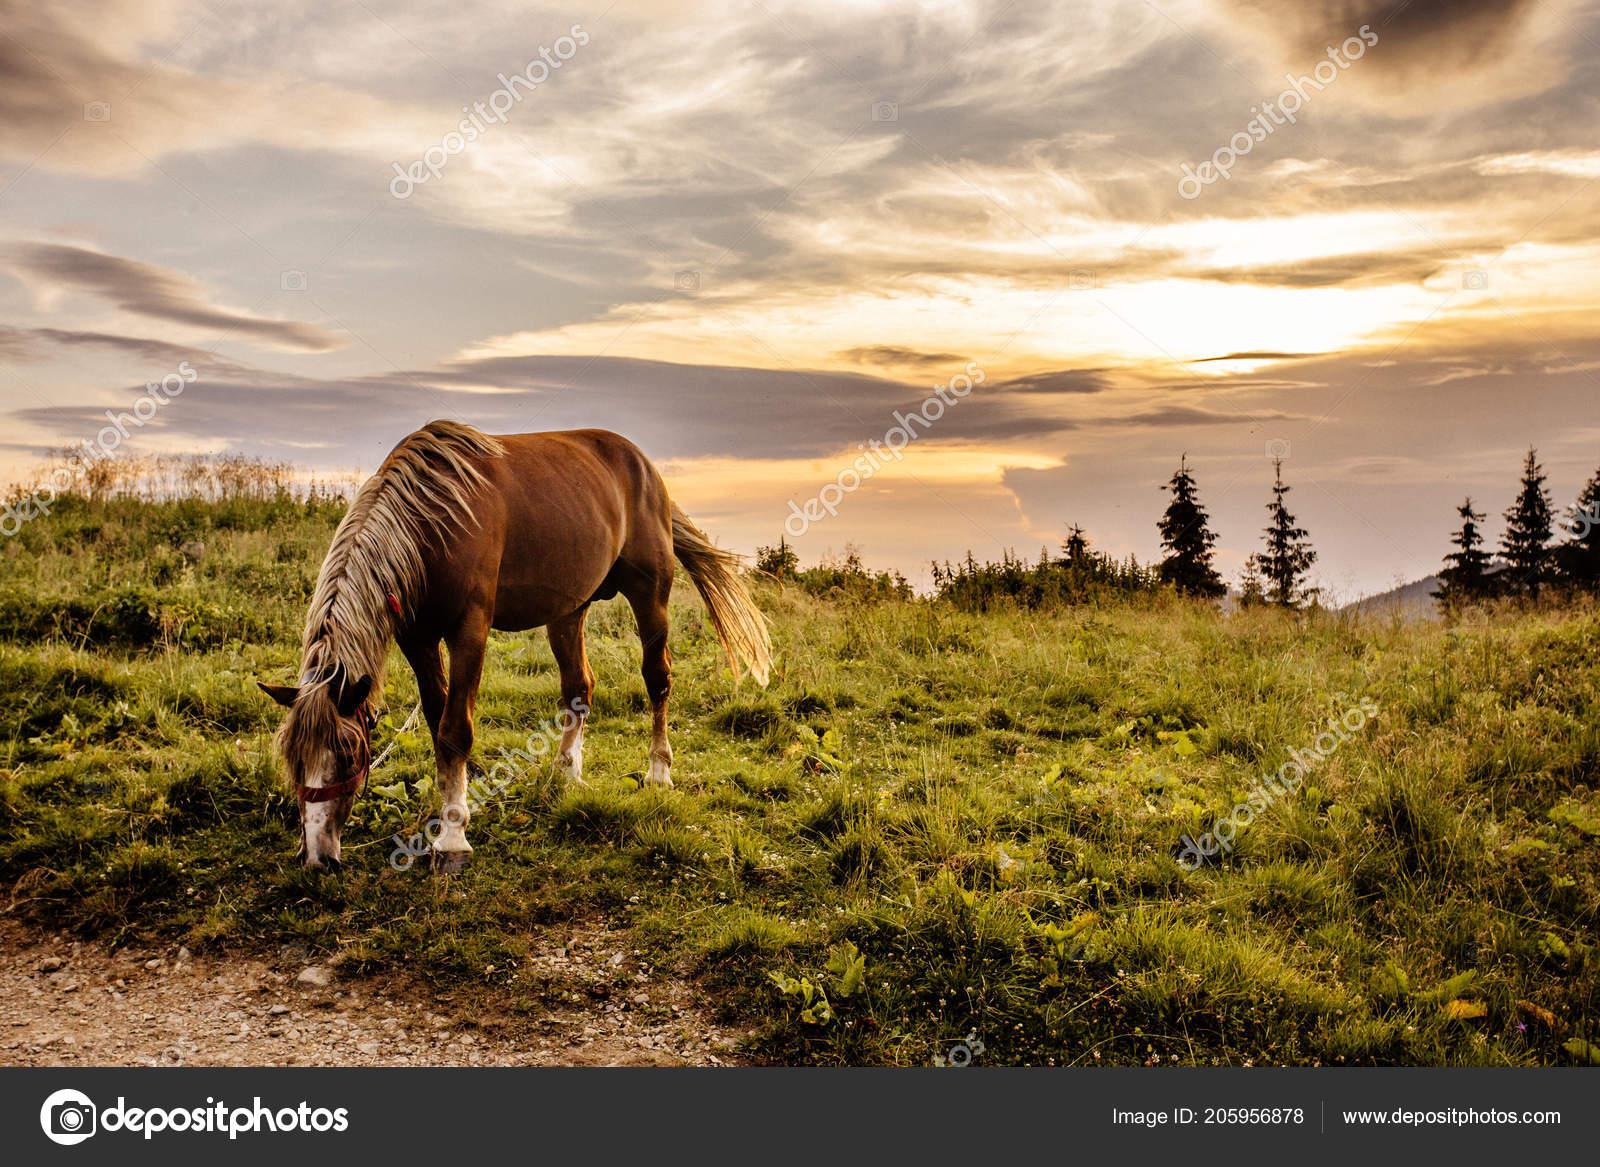 Horse Background Beautiful Nature Mountains Sunset